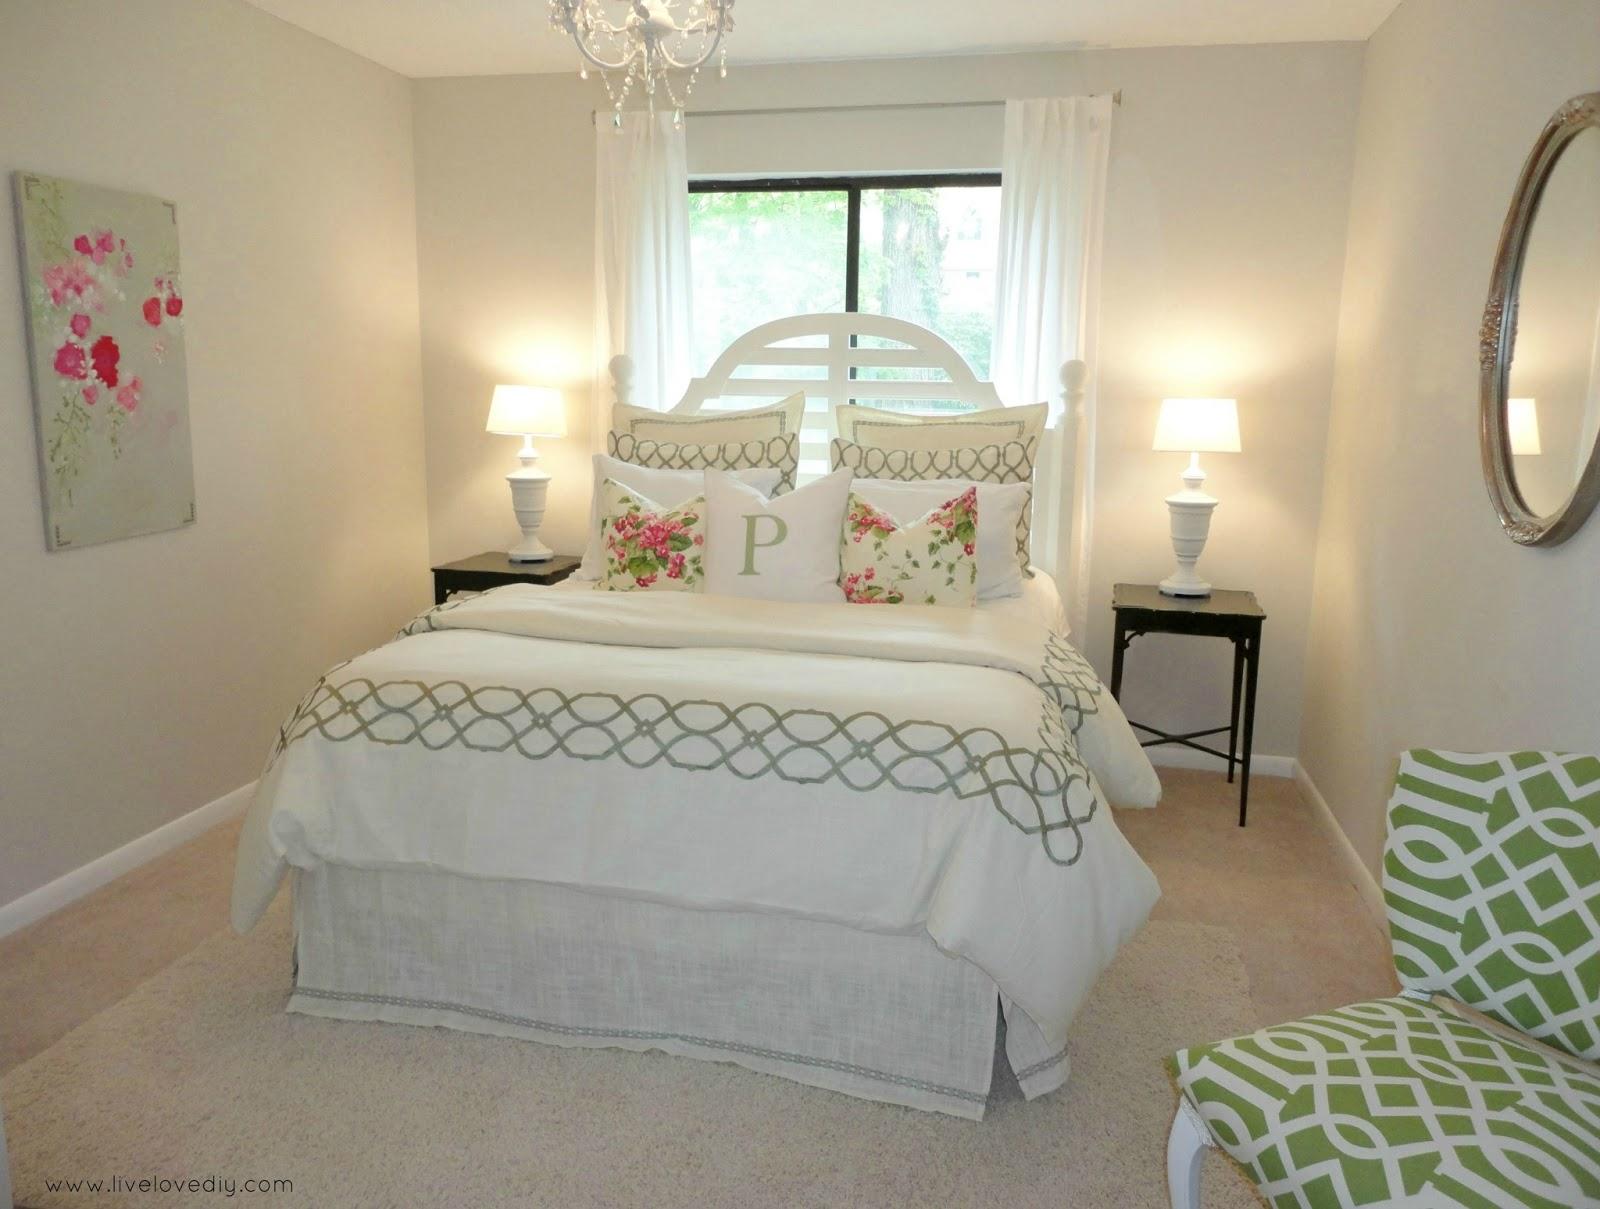 Bedroom Clipart Guest Room Bedroom Guest Room Transparent Free